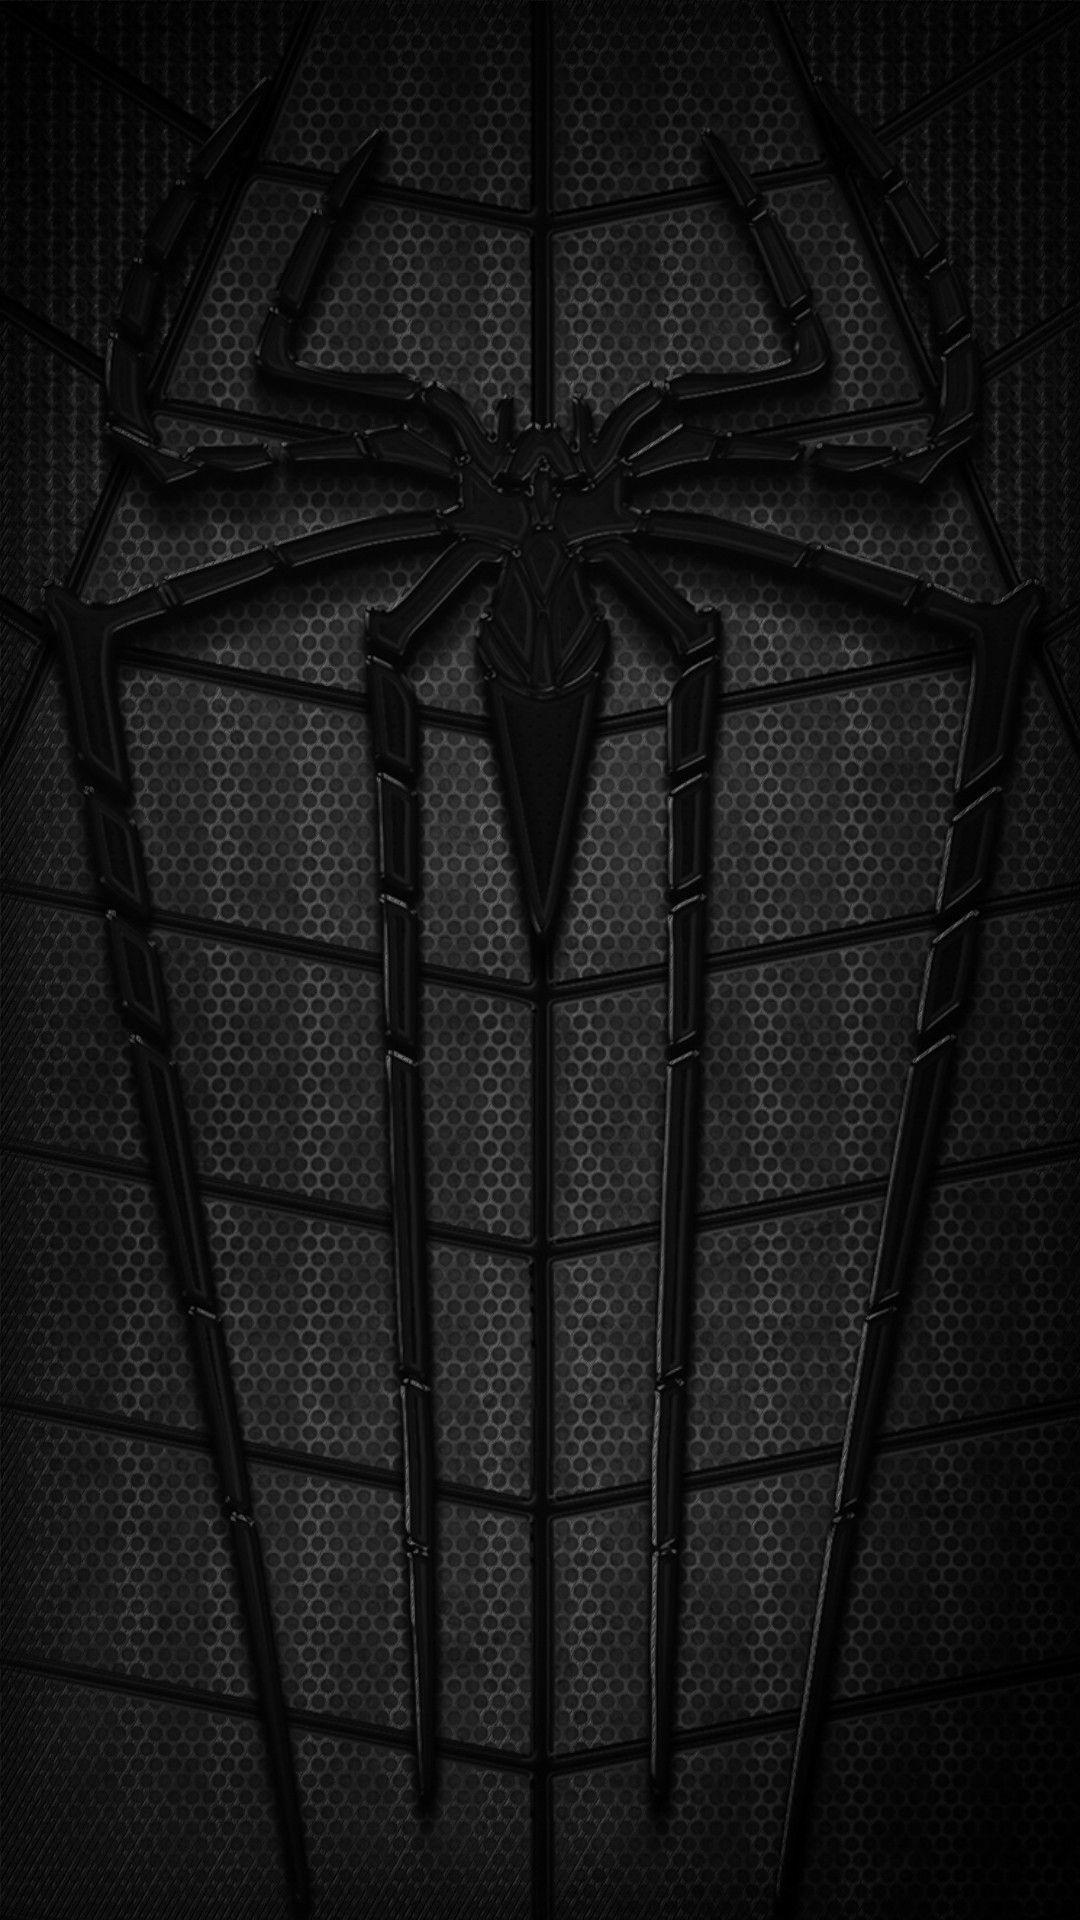 Spider Man Logo White Phone Wallpapers   Top Spider Man Logo 1080x1920